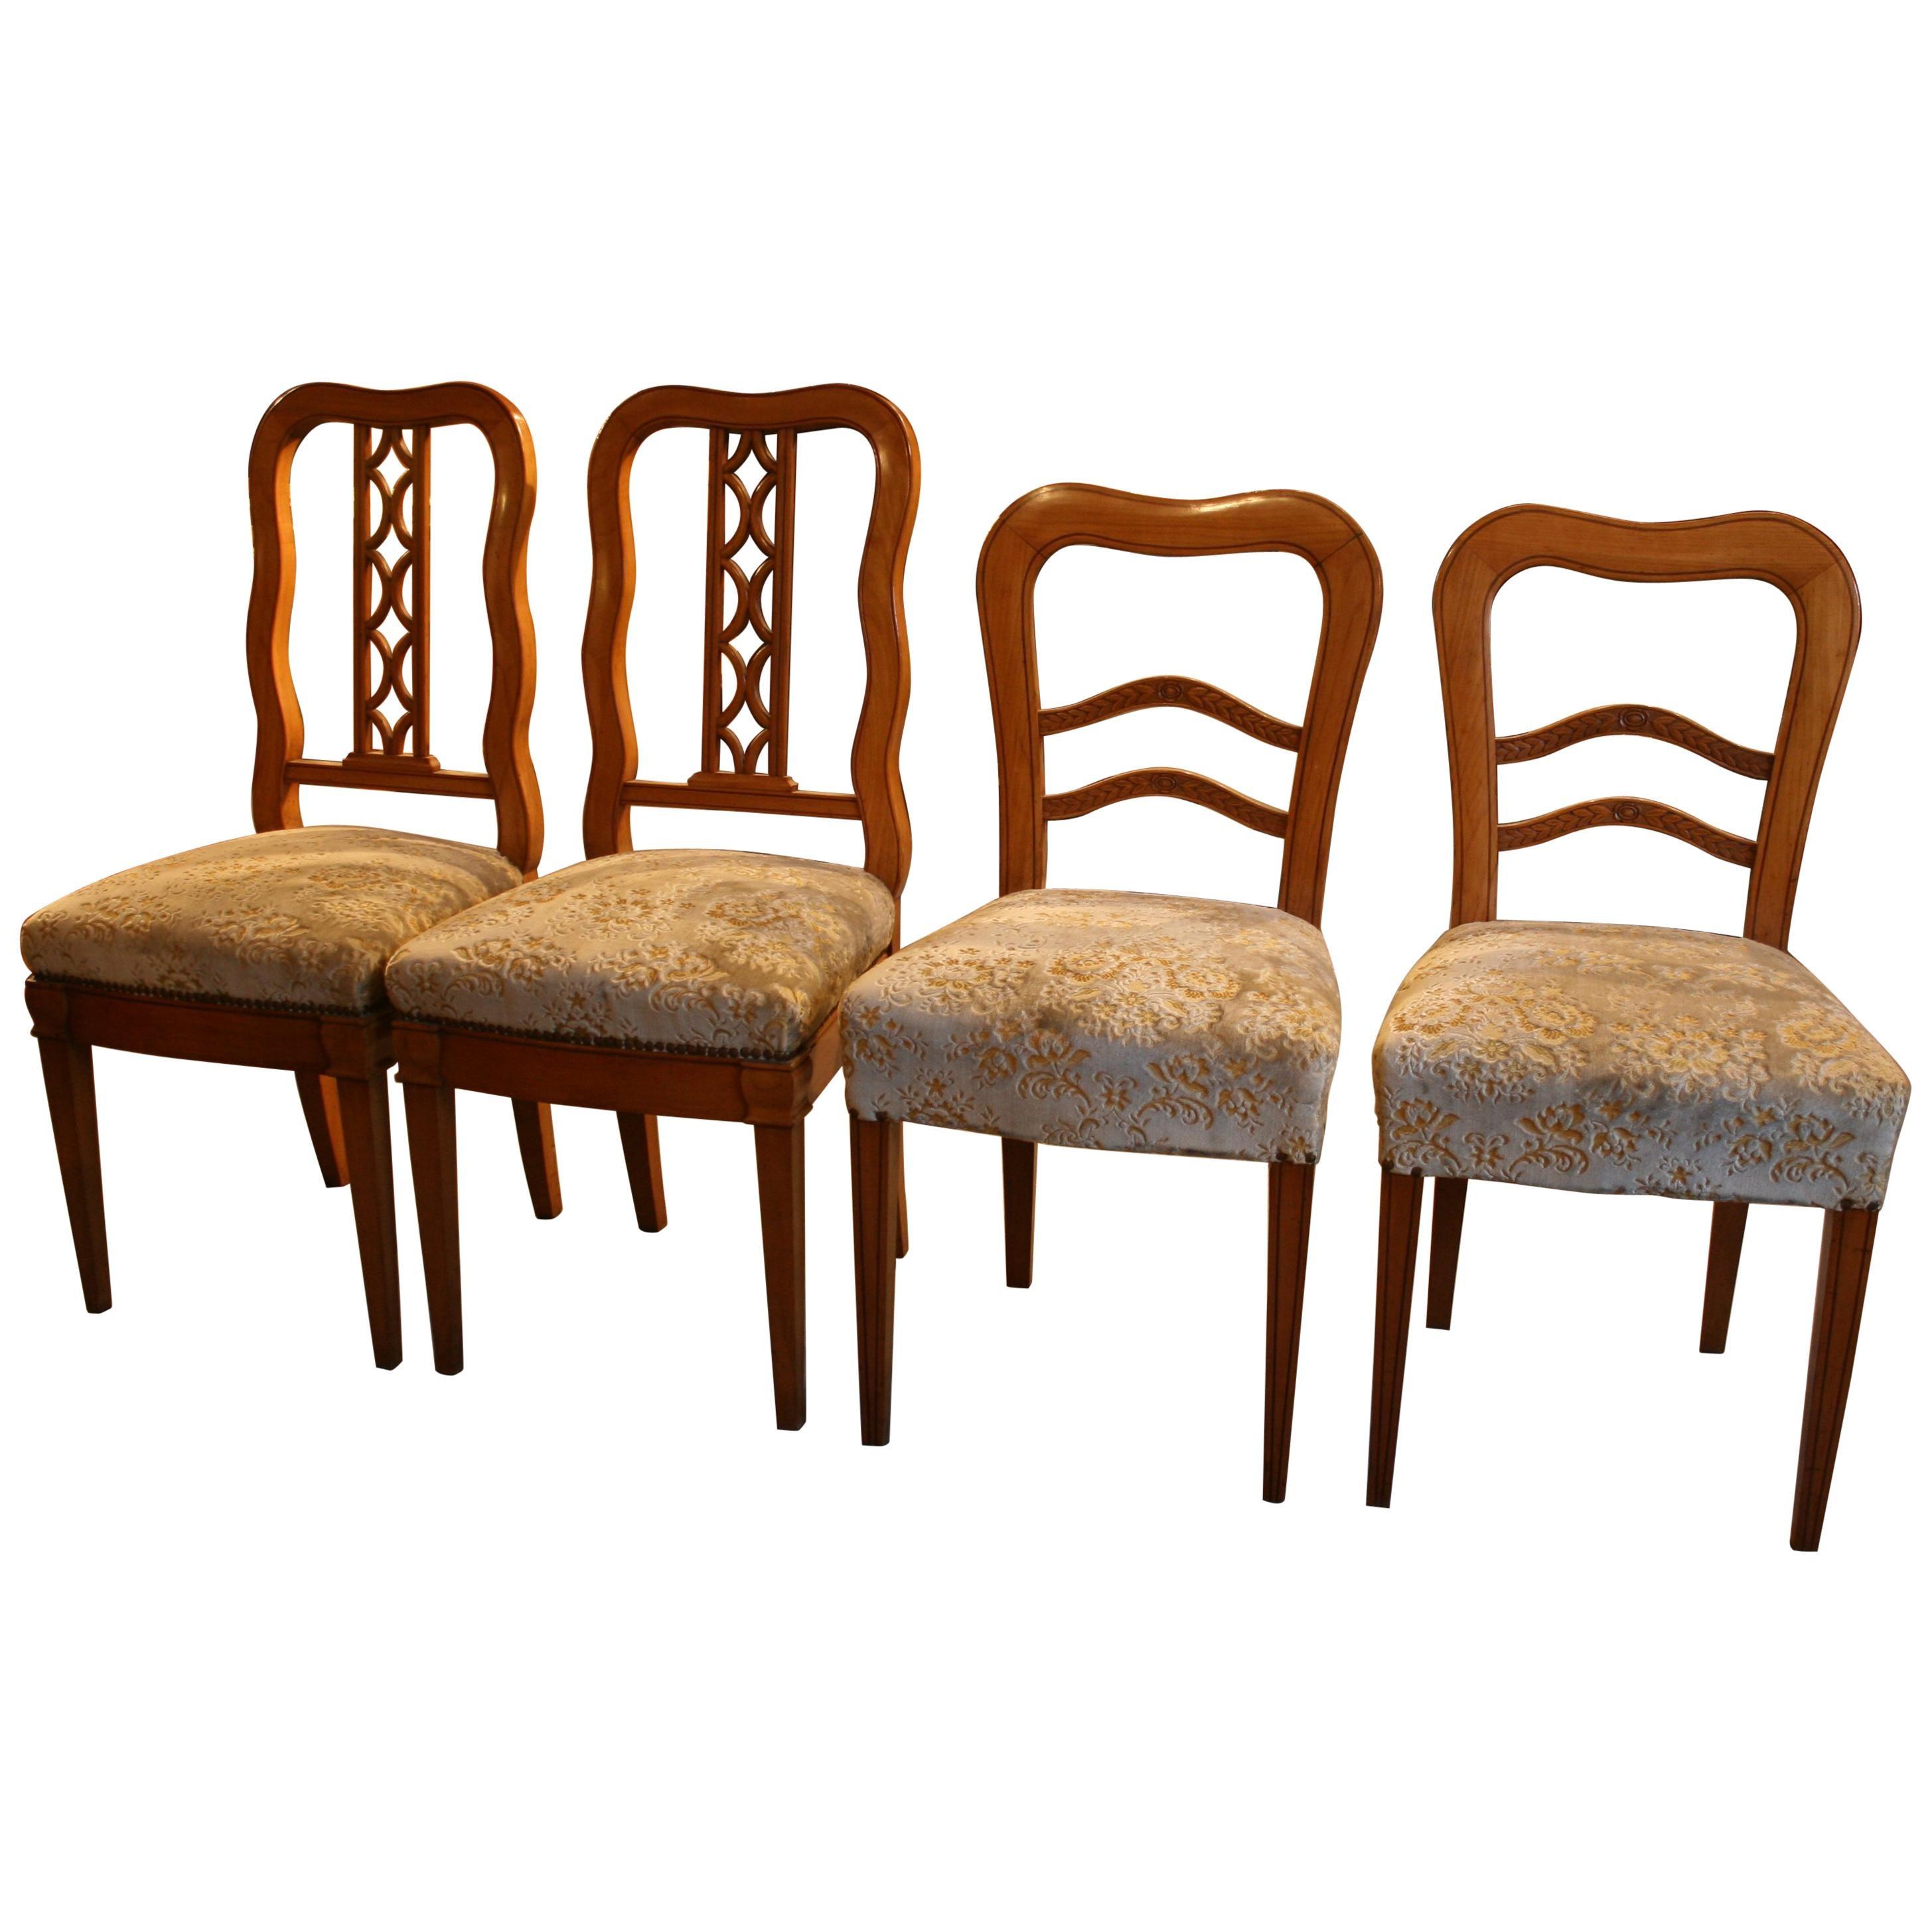 Antique German Biedermeier Chairs, Set of 4, Fruitwood, circa 1840